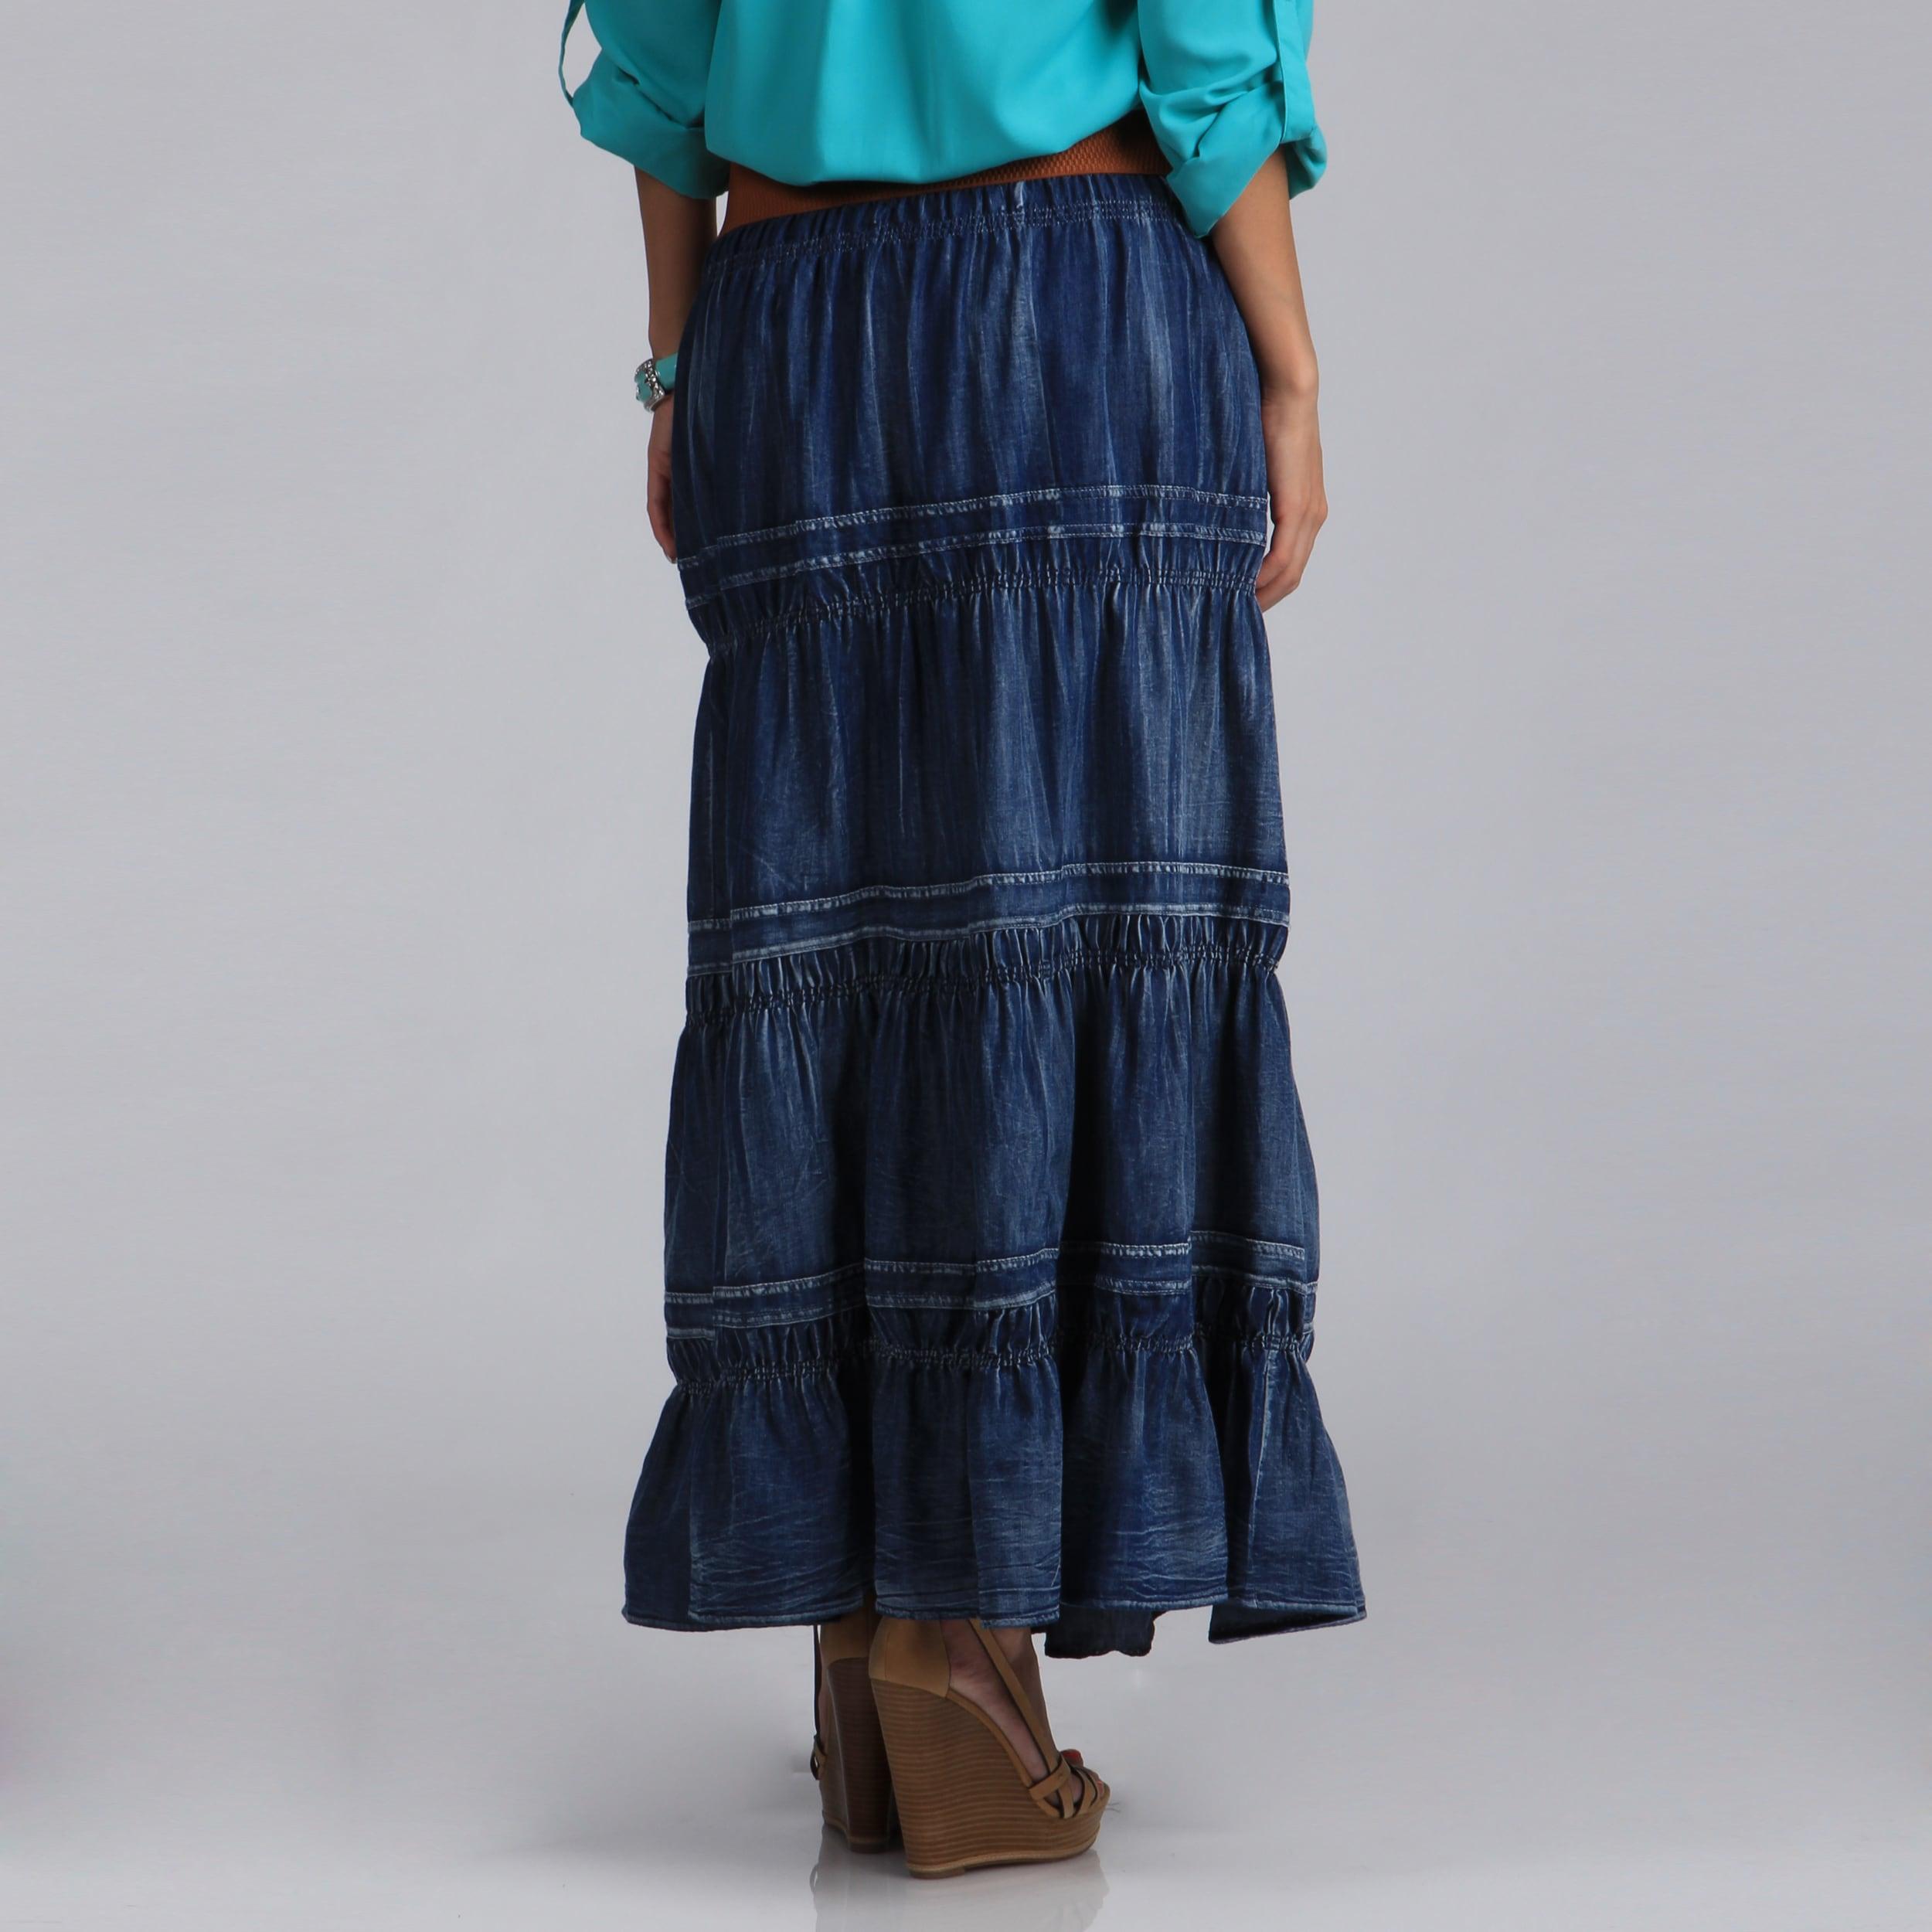 5a4835fc9 Shop Meetu Magic Women's Stonewash Denim Tiered Maxi Skirt - Free ...